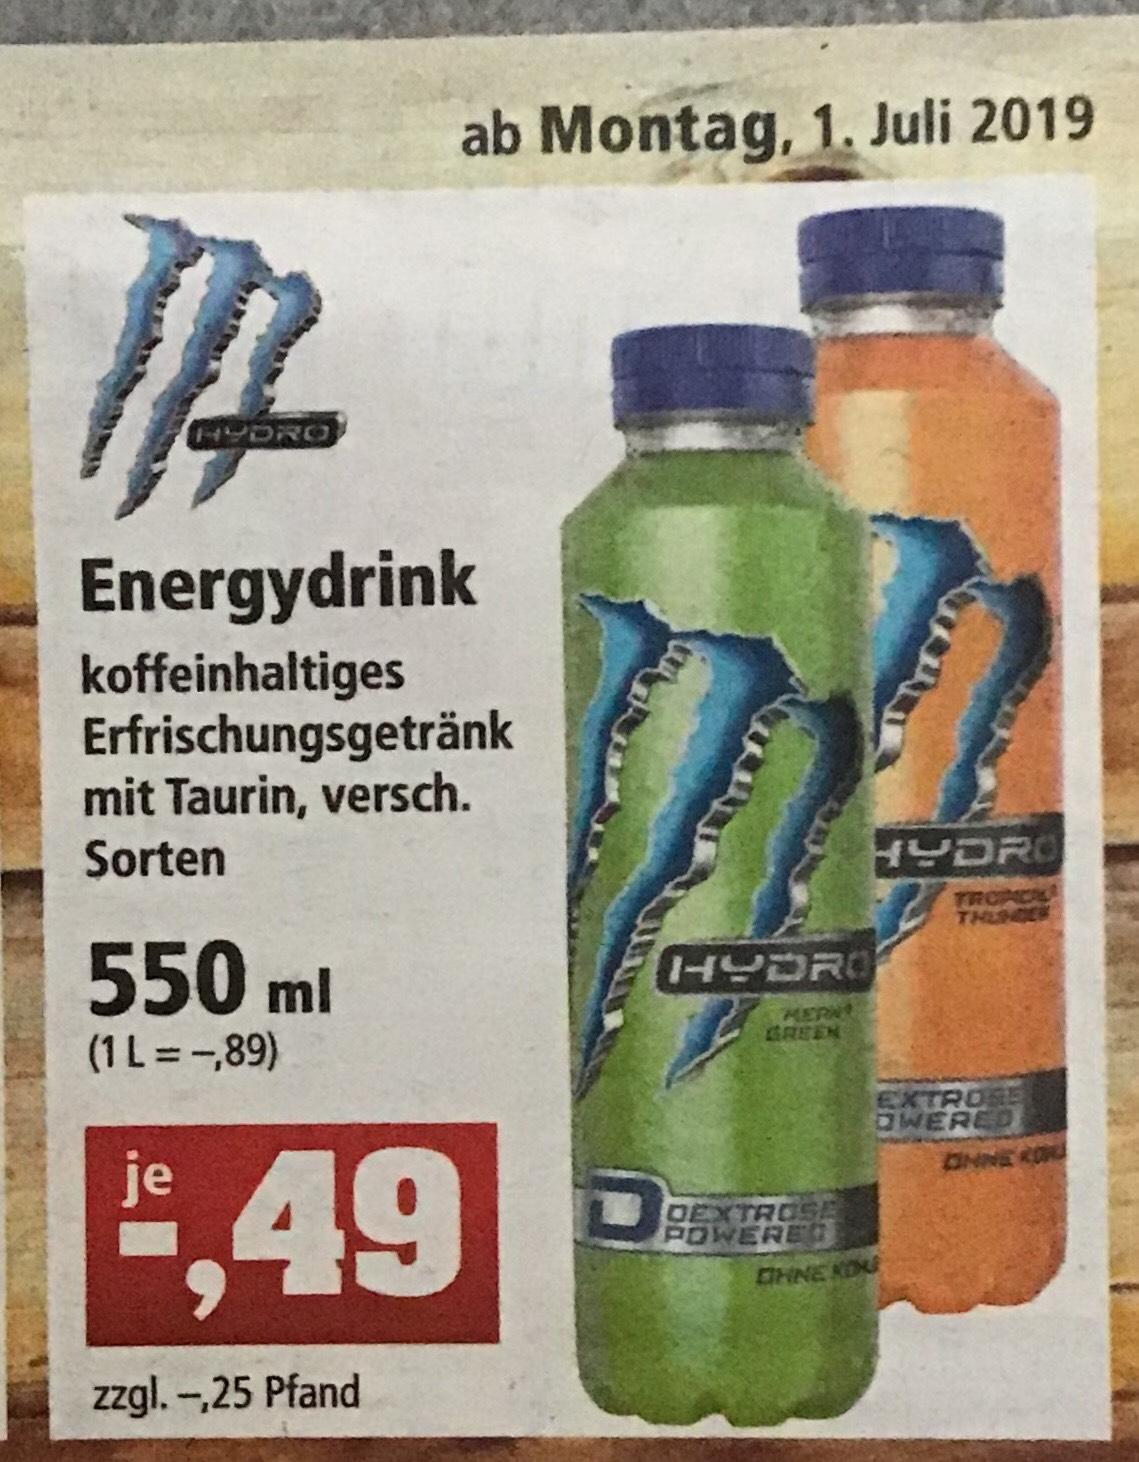 (Thomas Philipps) Monster Energy Hydro für 0,49€